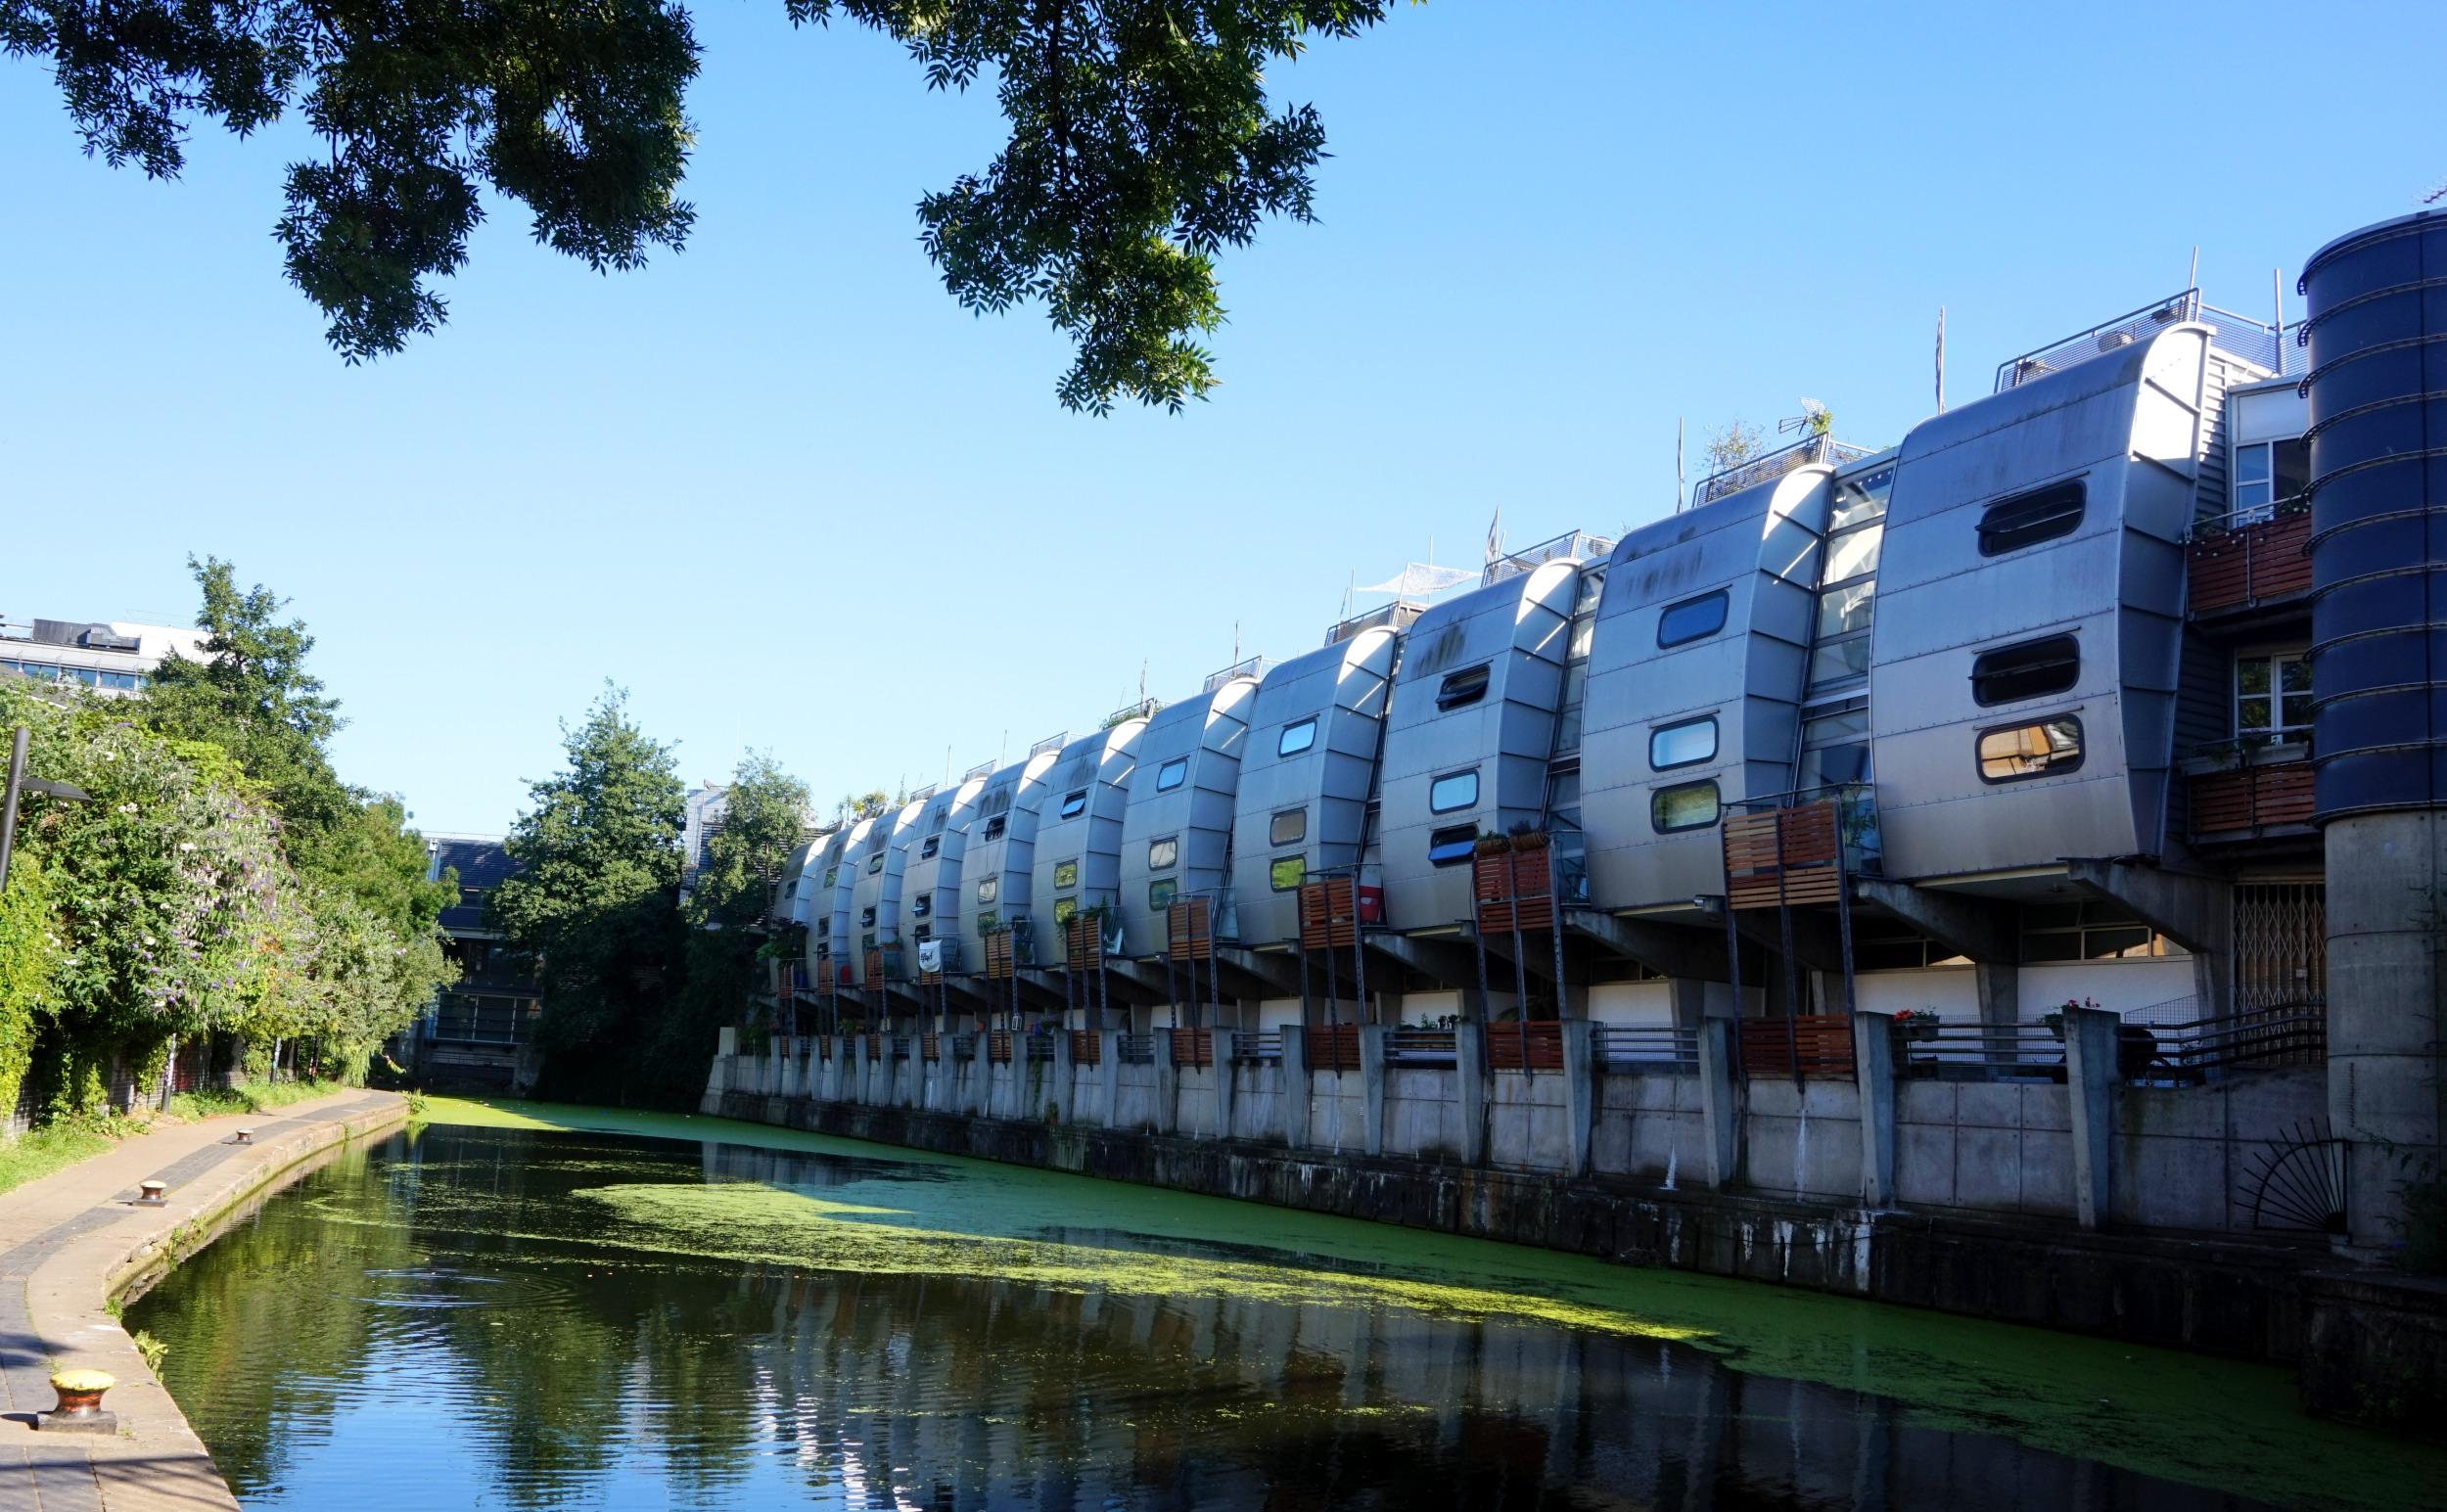 Regents-Canal-61